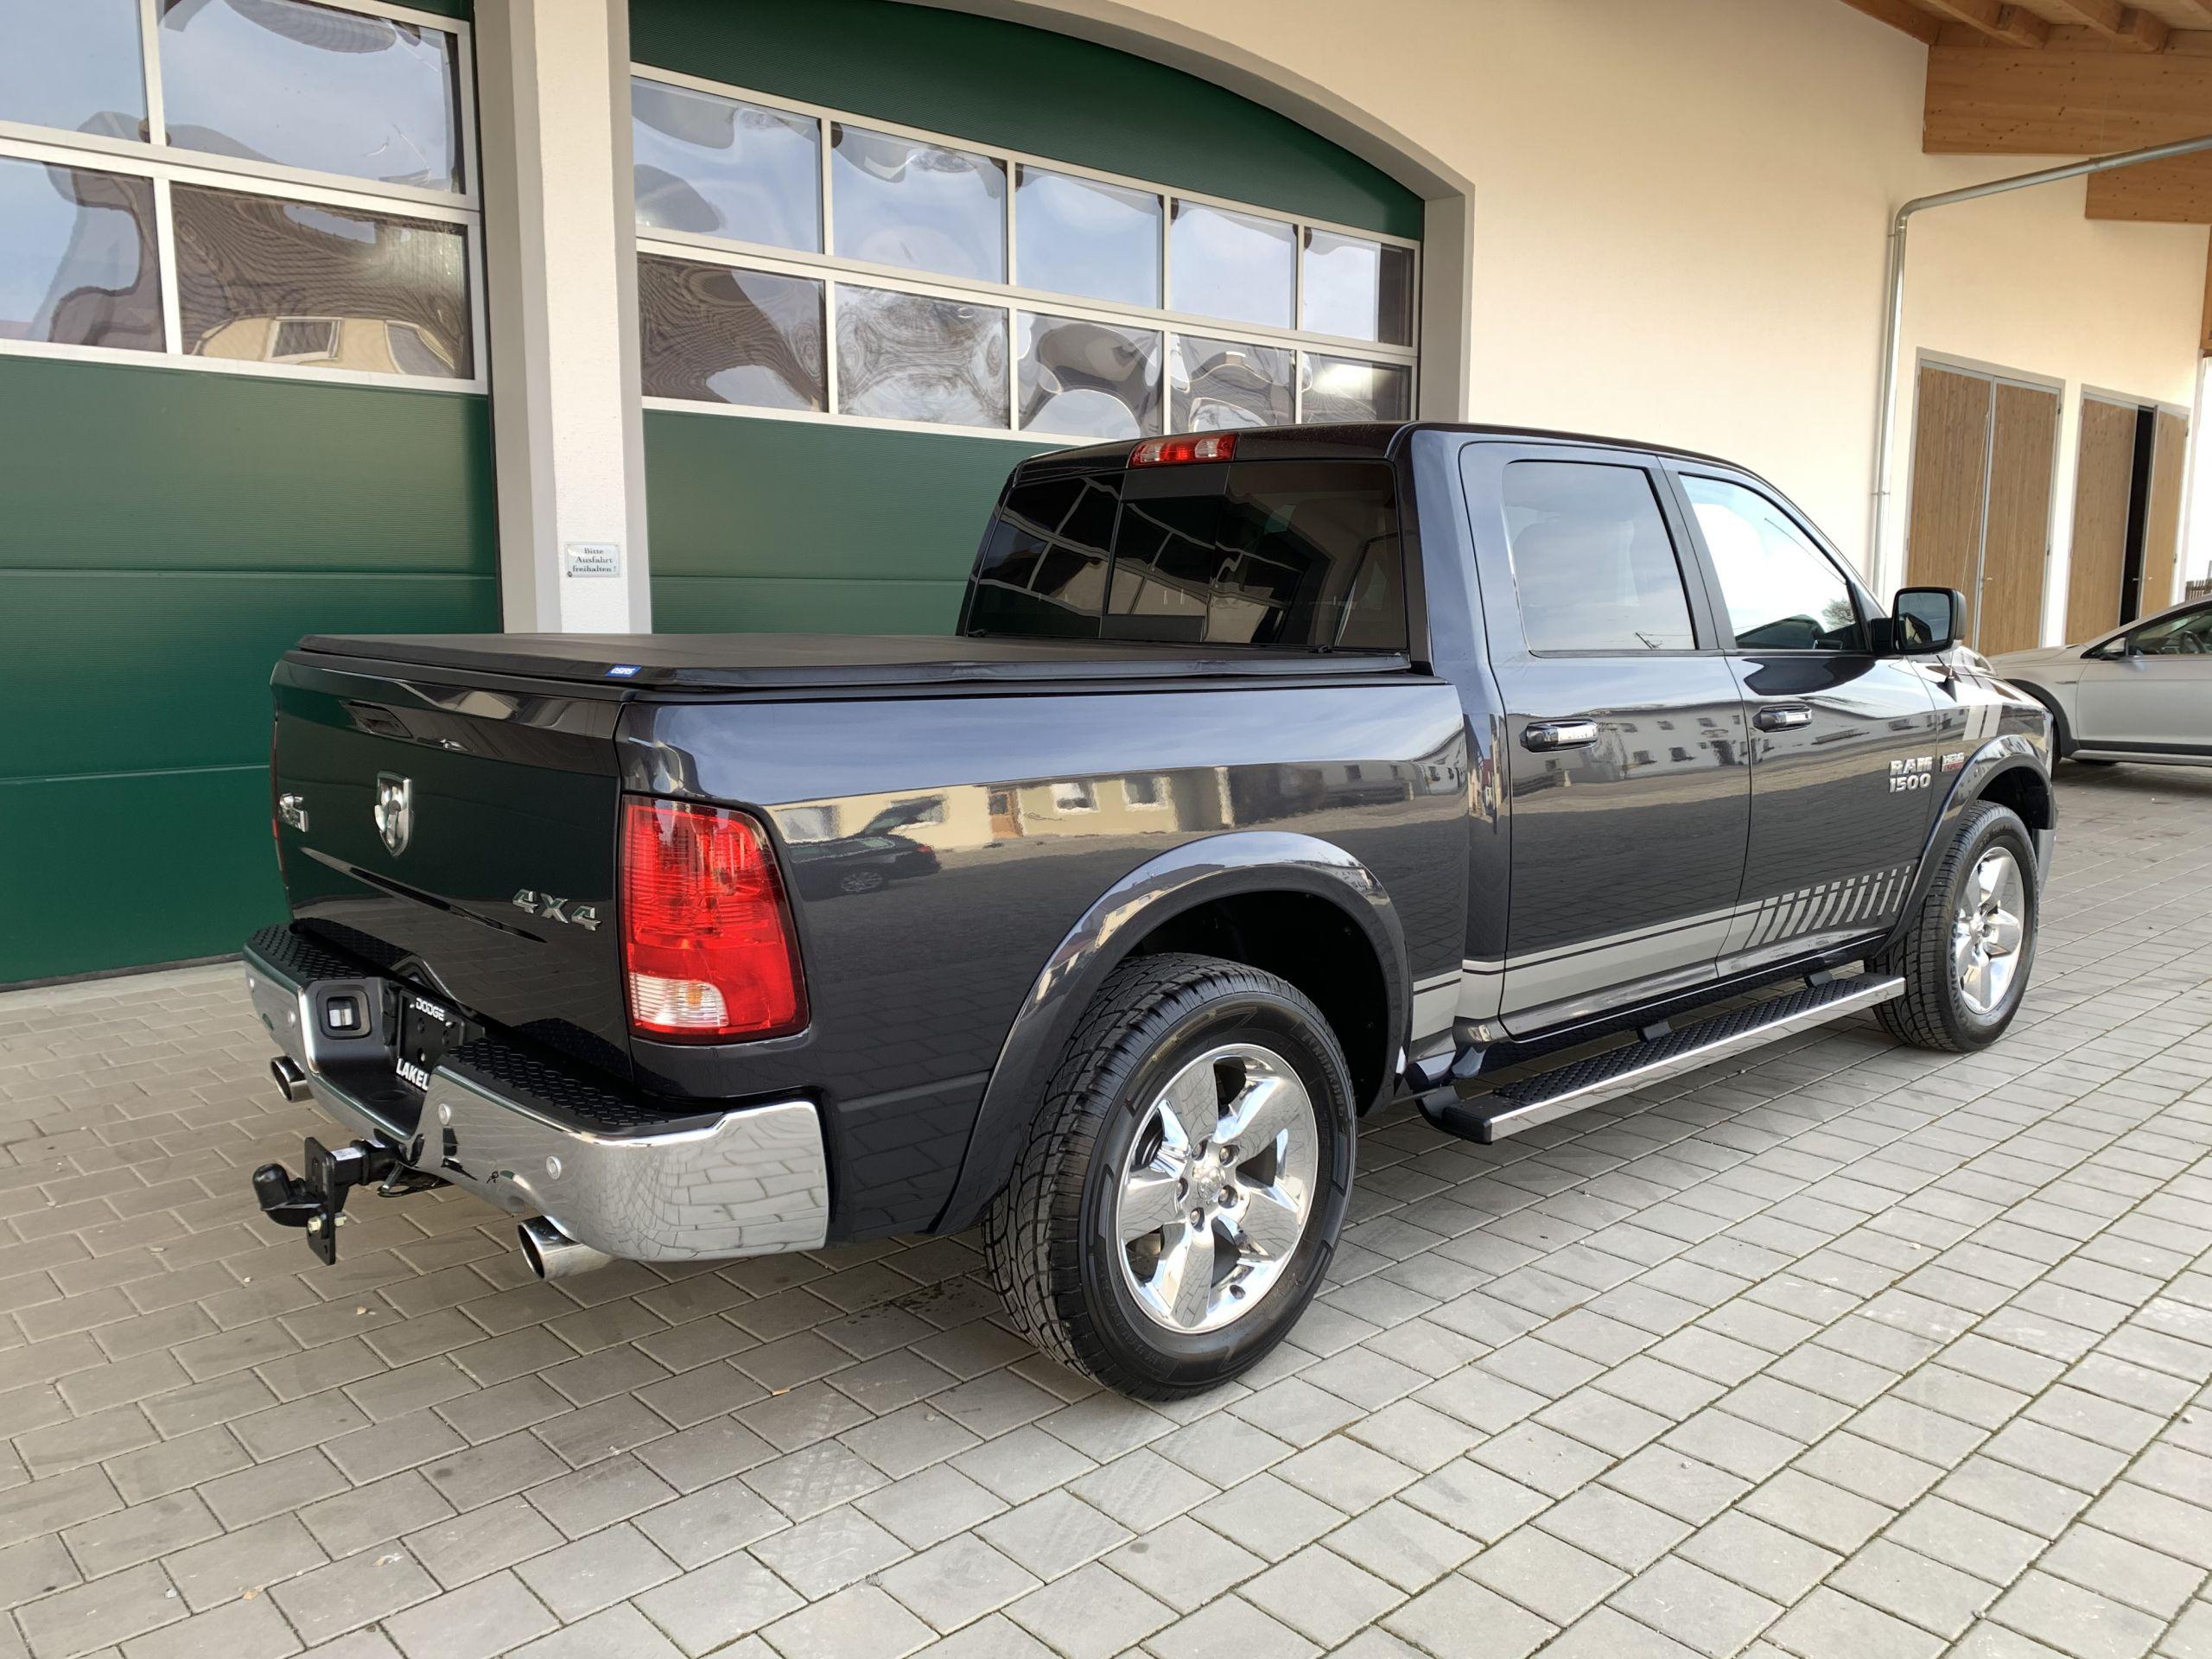 Dodge Ram 1500 Crew Cab SLT BIG HORN zu Verkaufen Schweiz